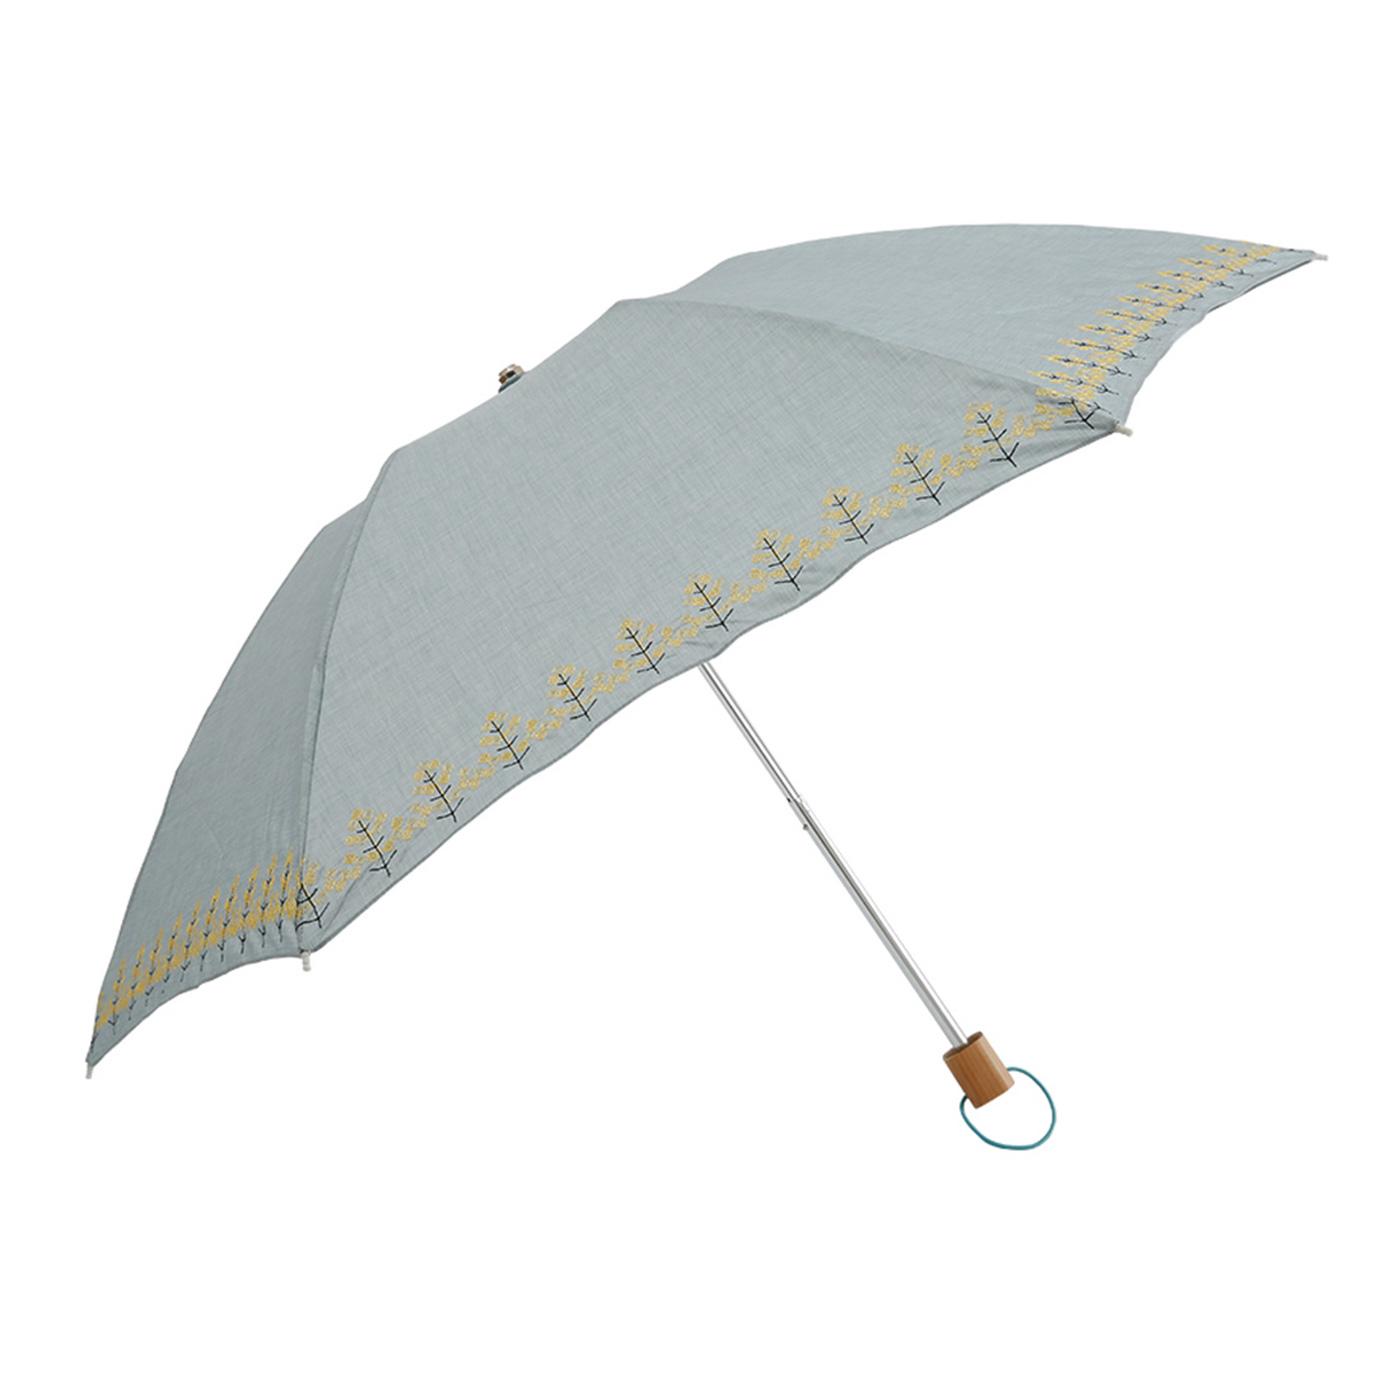 IEDIT[イディット] SELECT korko 菜の花刺しゅうの 晴雨兼用折りたたみ日傘〈グレー〉